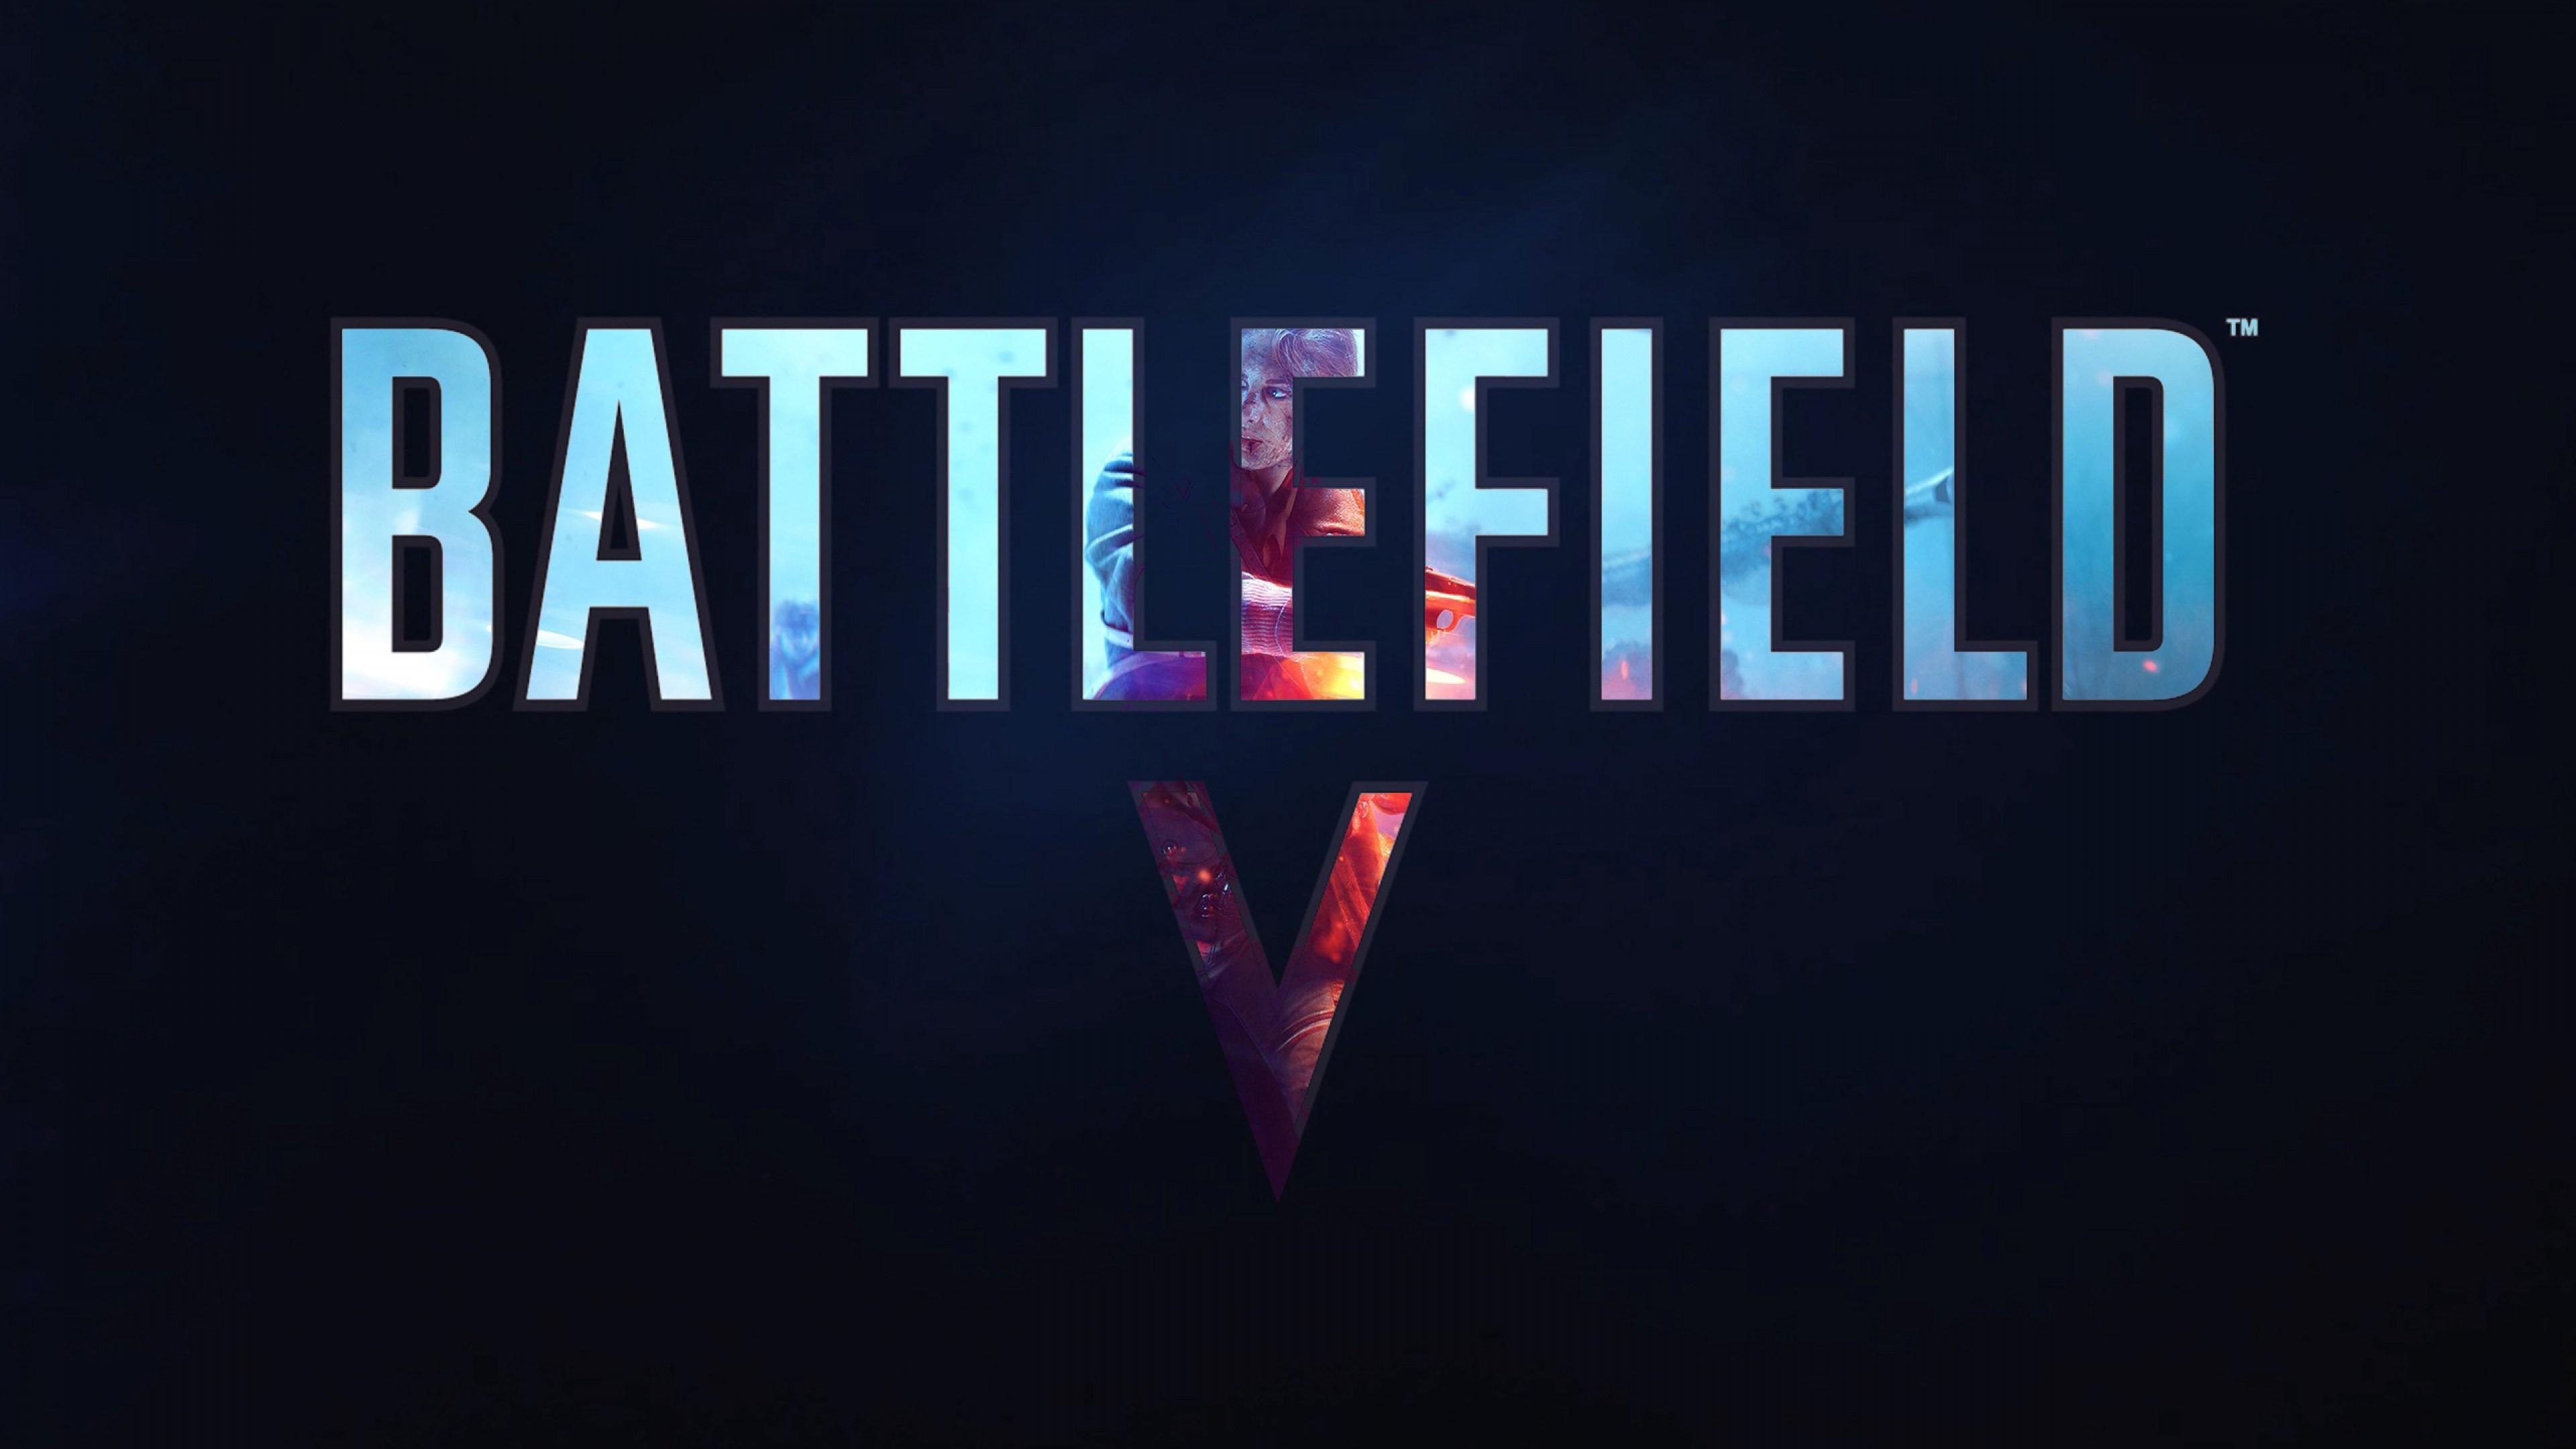 Battlefield V Poster - Battlefield 5 Wallpaper 4k , HD Wallpaper & Backgrounds